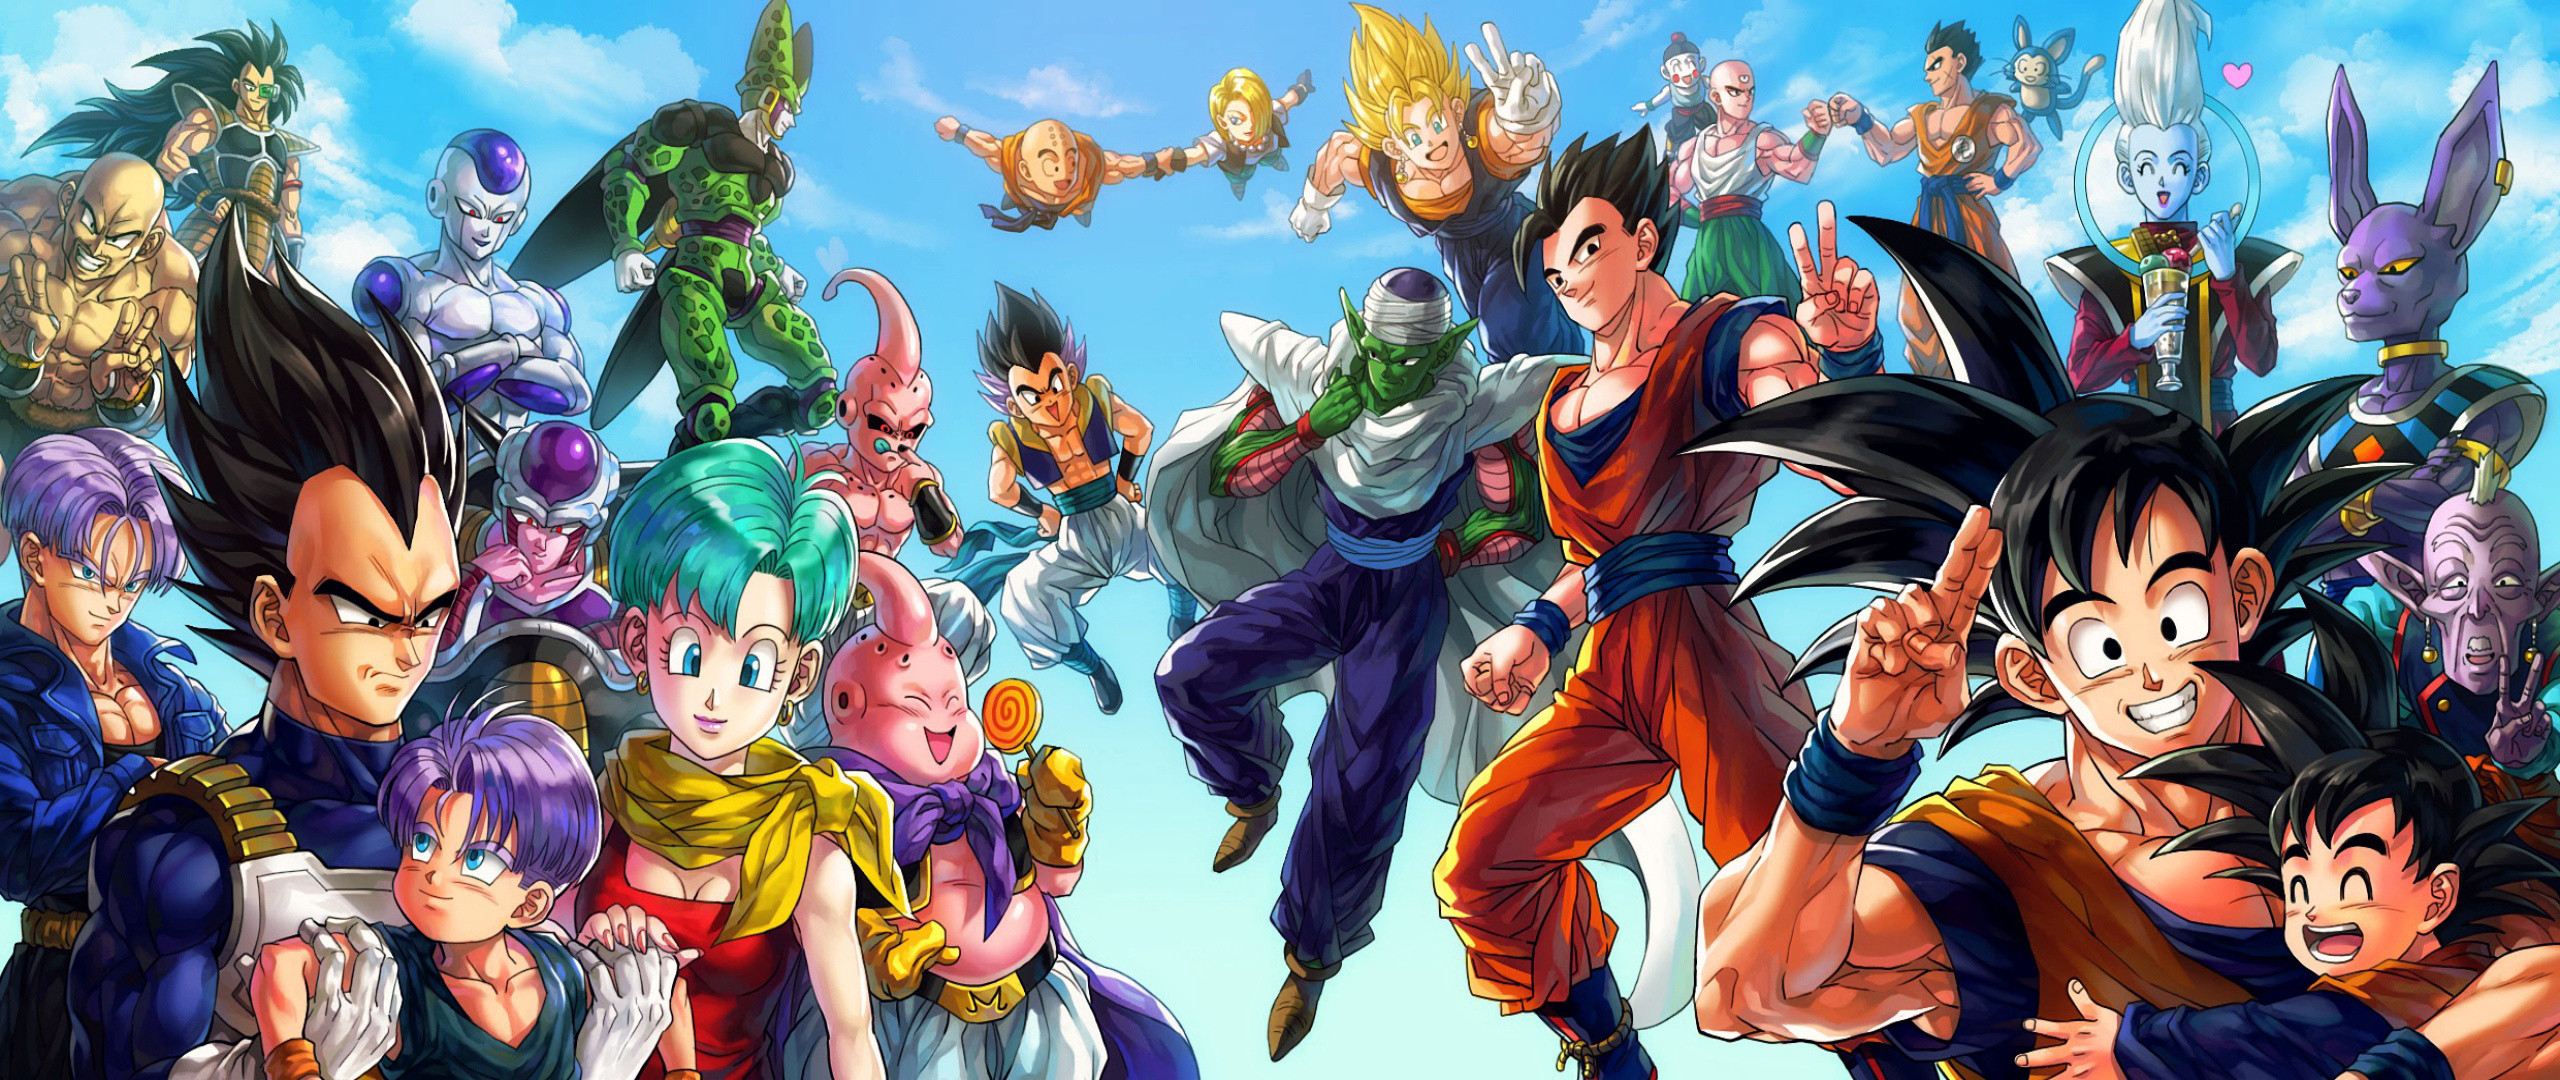 Dragon Ball Desktop Wallpaper